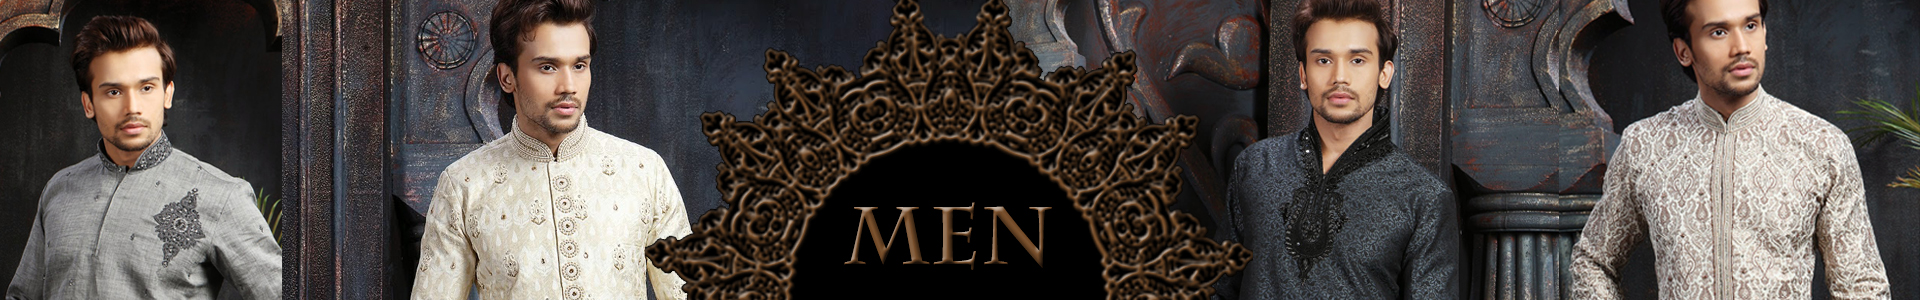 men banner1